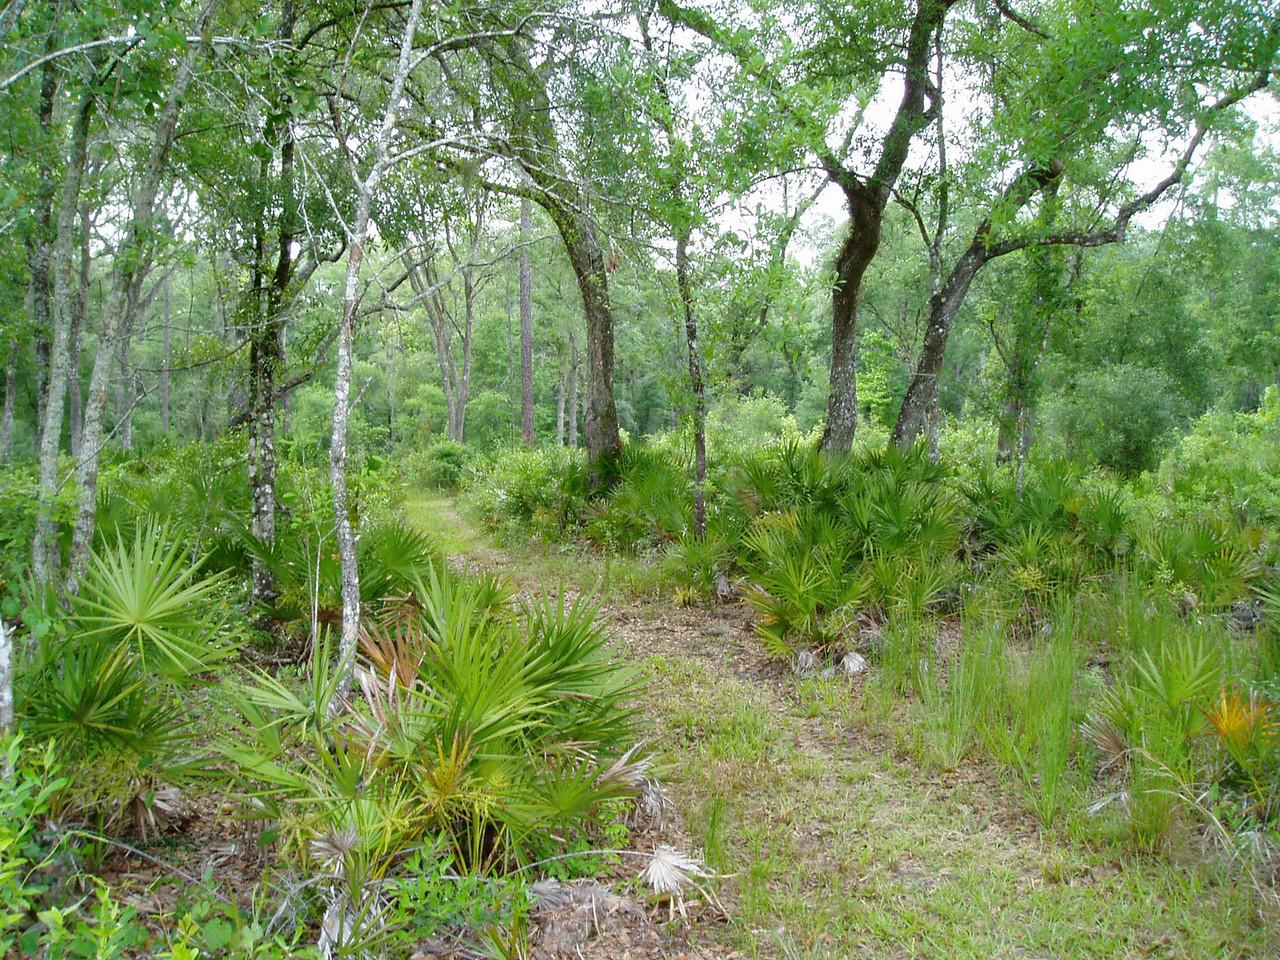 Hardwood forest north of Bridge Rd in Green Swamp West  <br /> photo credit: FTA / Deb Blick